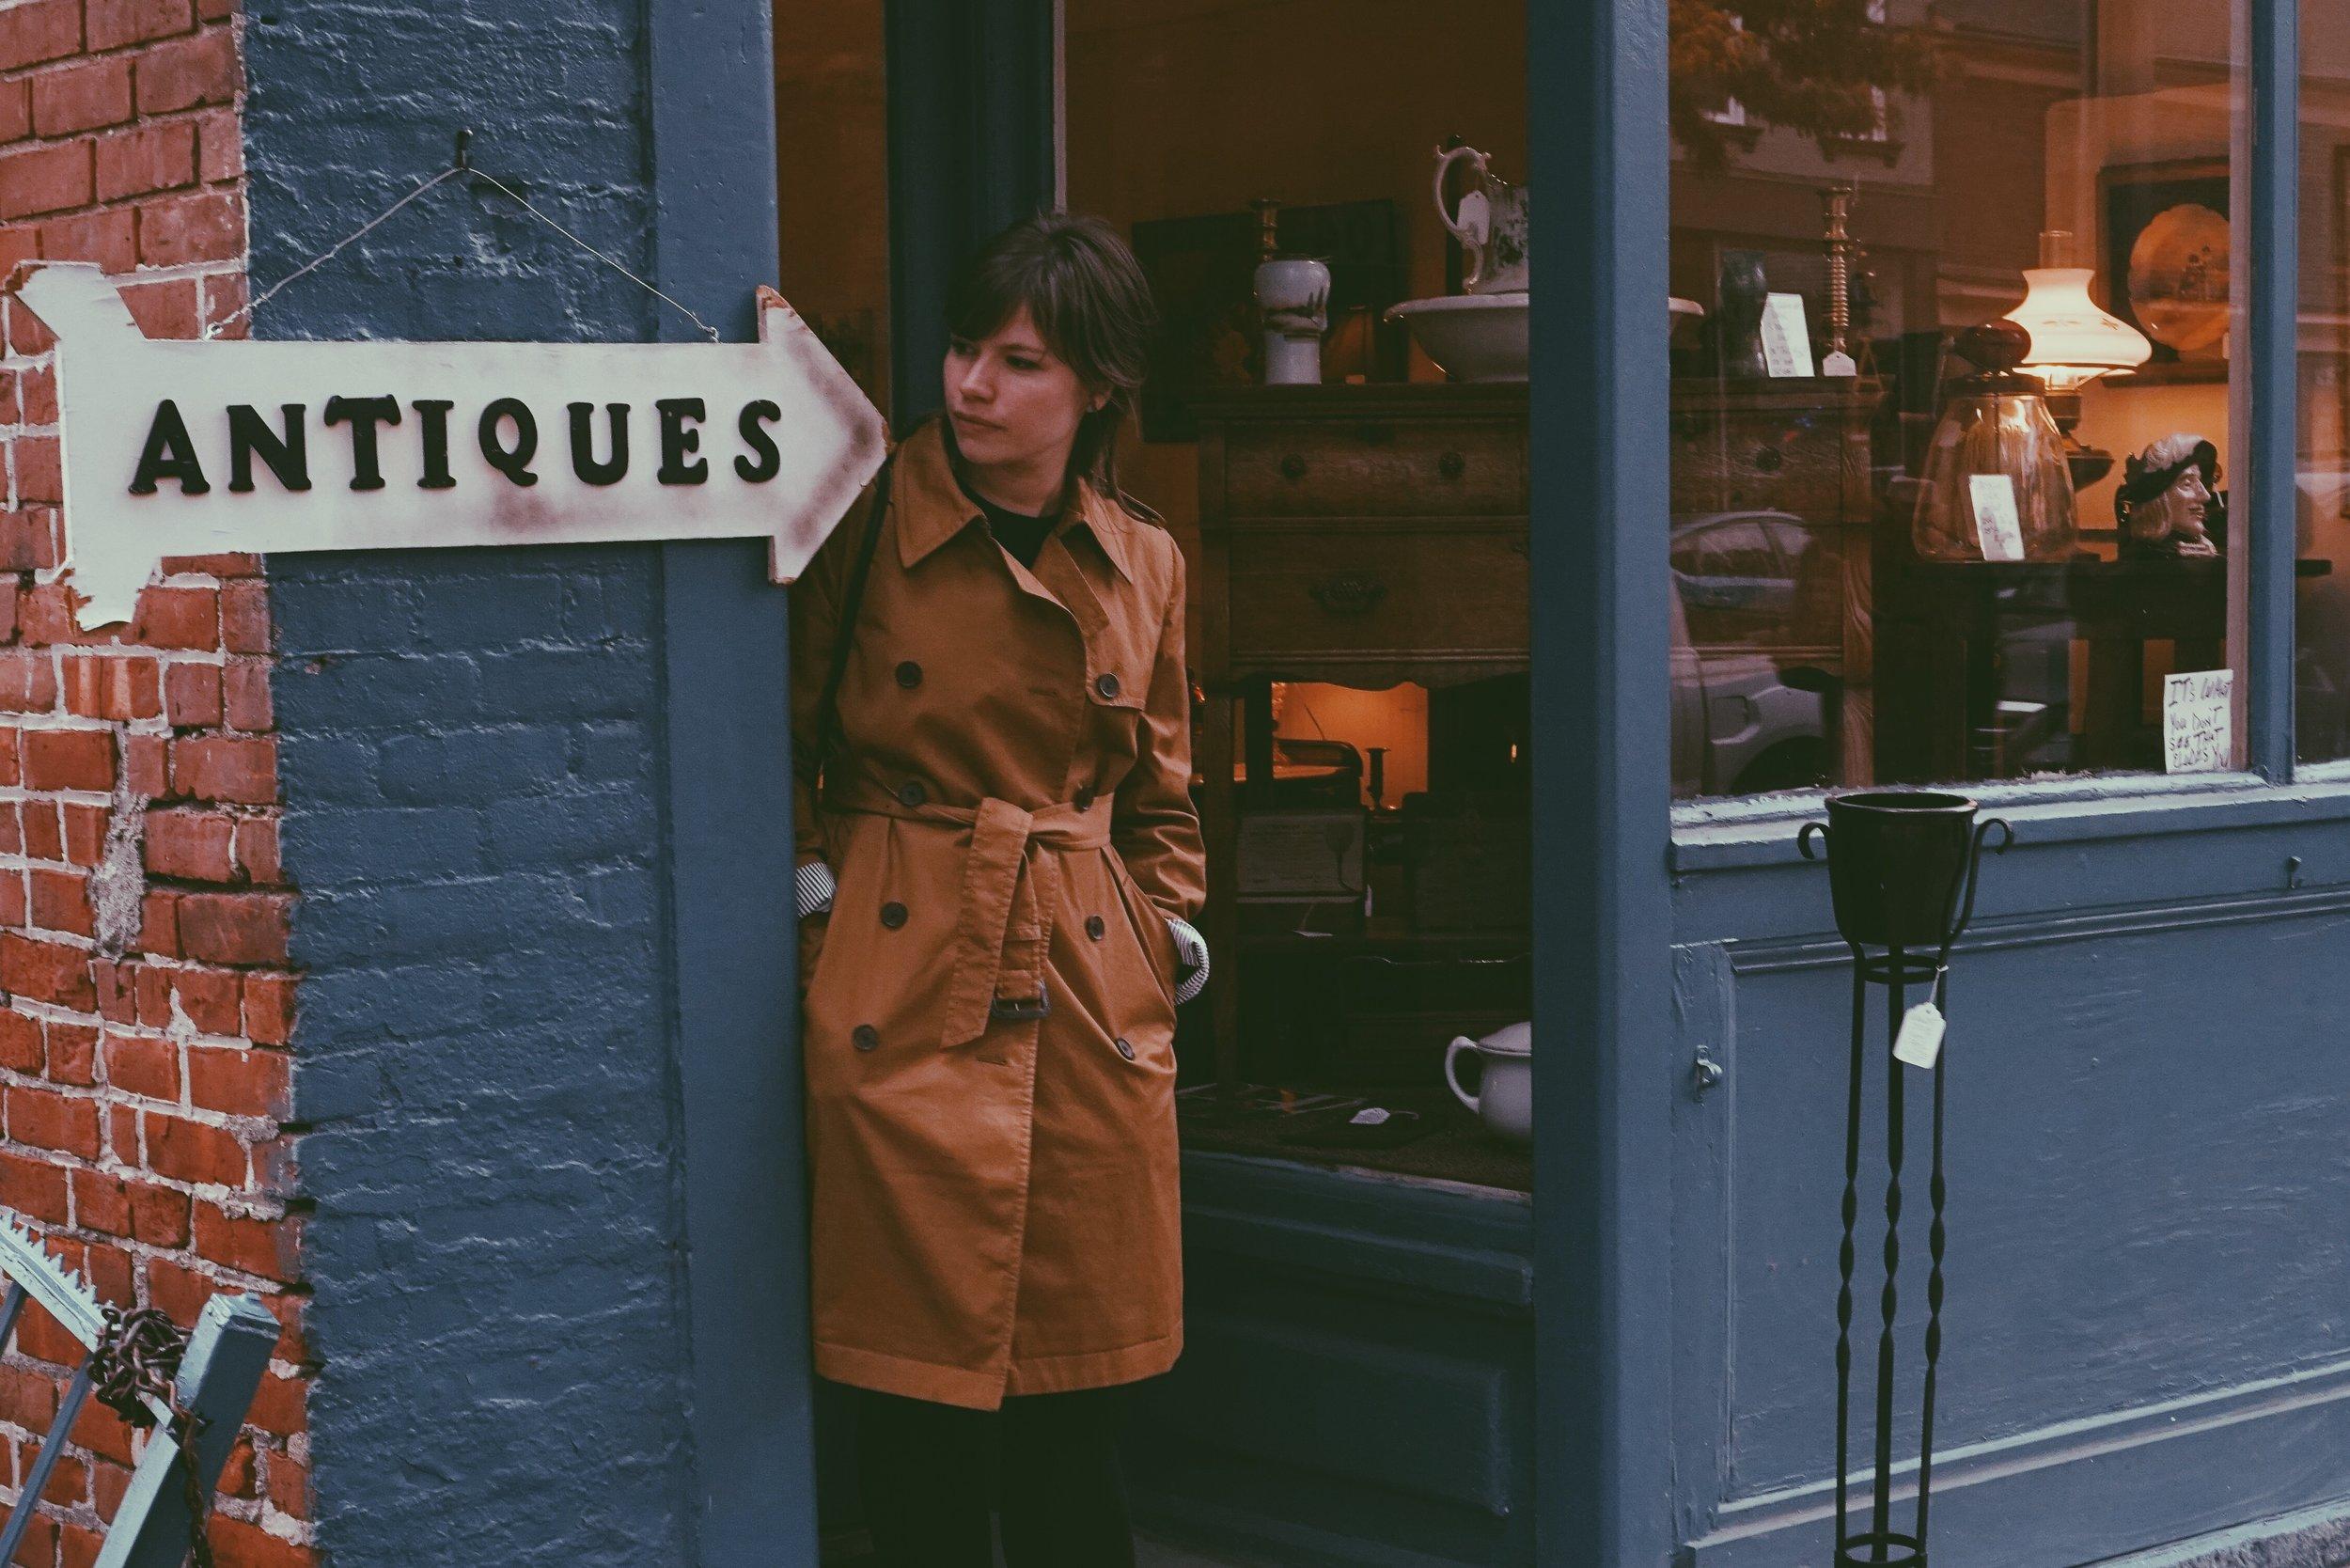 deidre-and-the-dark-antiques-shop-vintage-shopping